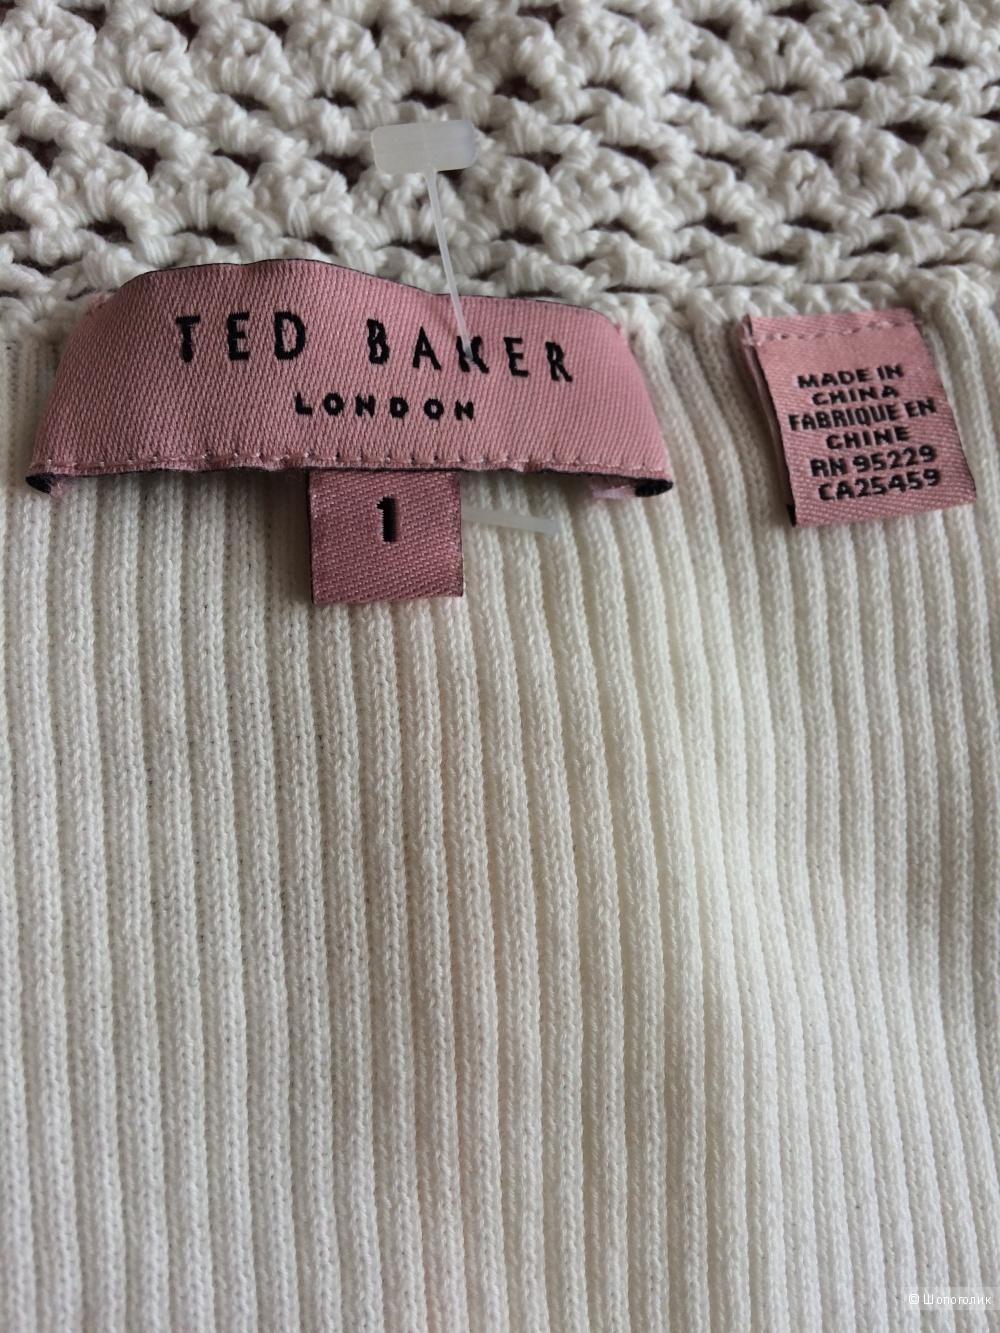 Маечка от Ted Baker, размер российский 42-44